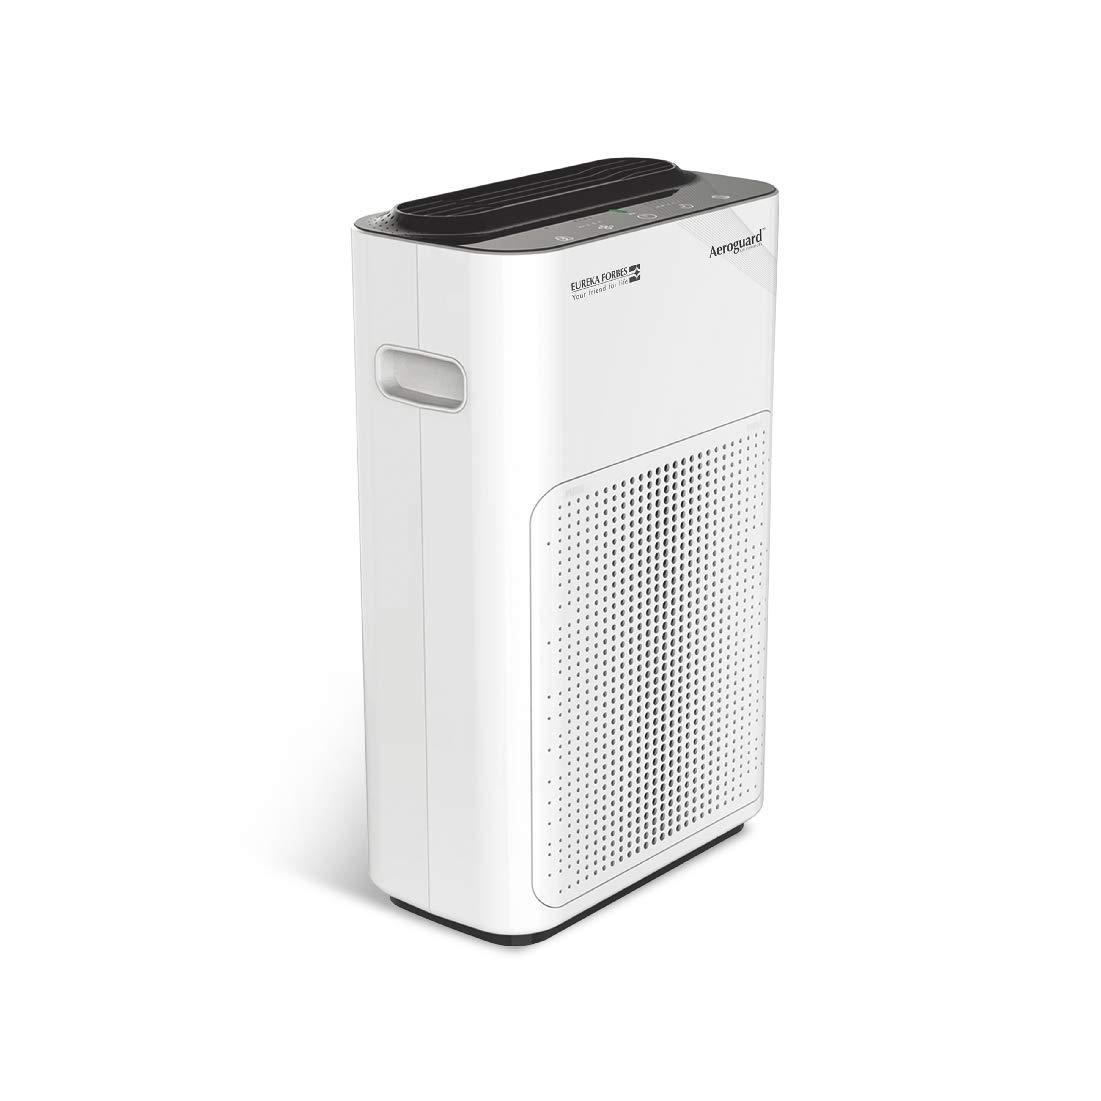 Eureka Forbes Aeroguard AP 500 with HEPA Filter,Filtermaxx Technology,Ozone Free, 1 Year Warranty(White)